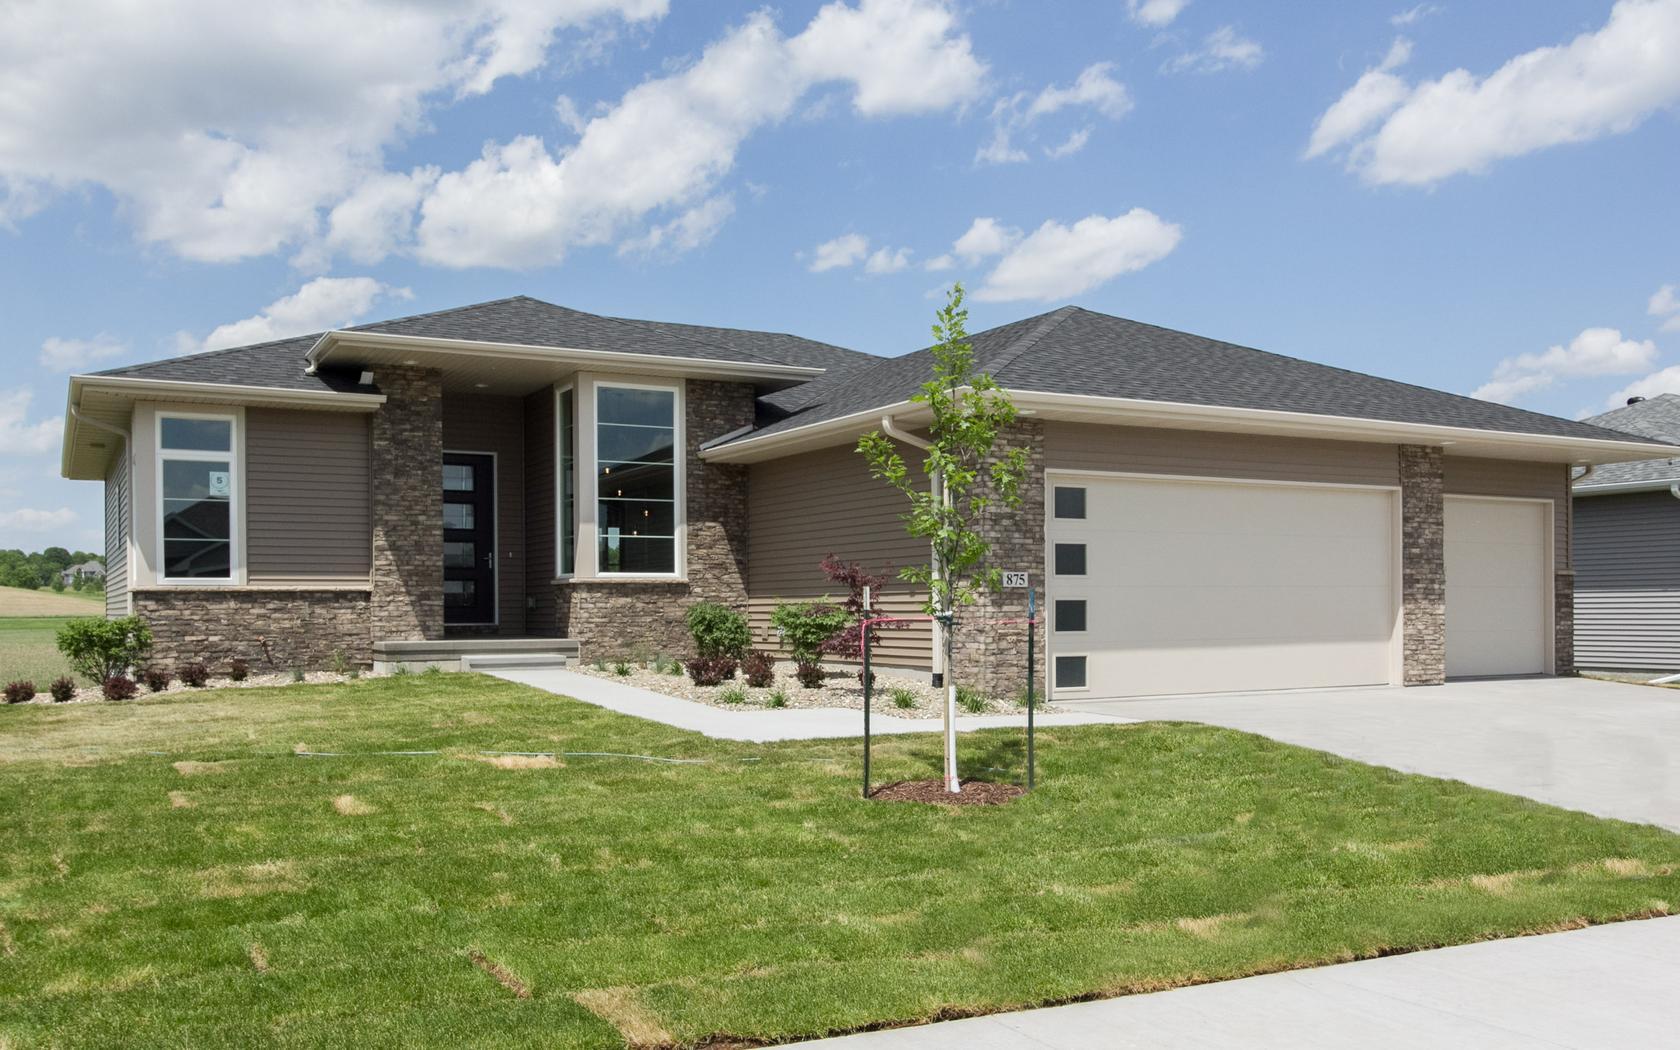 H&H Home Builders Exterior Design Image #42